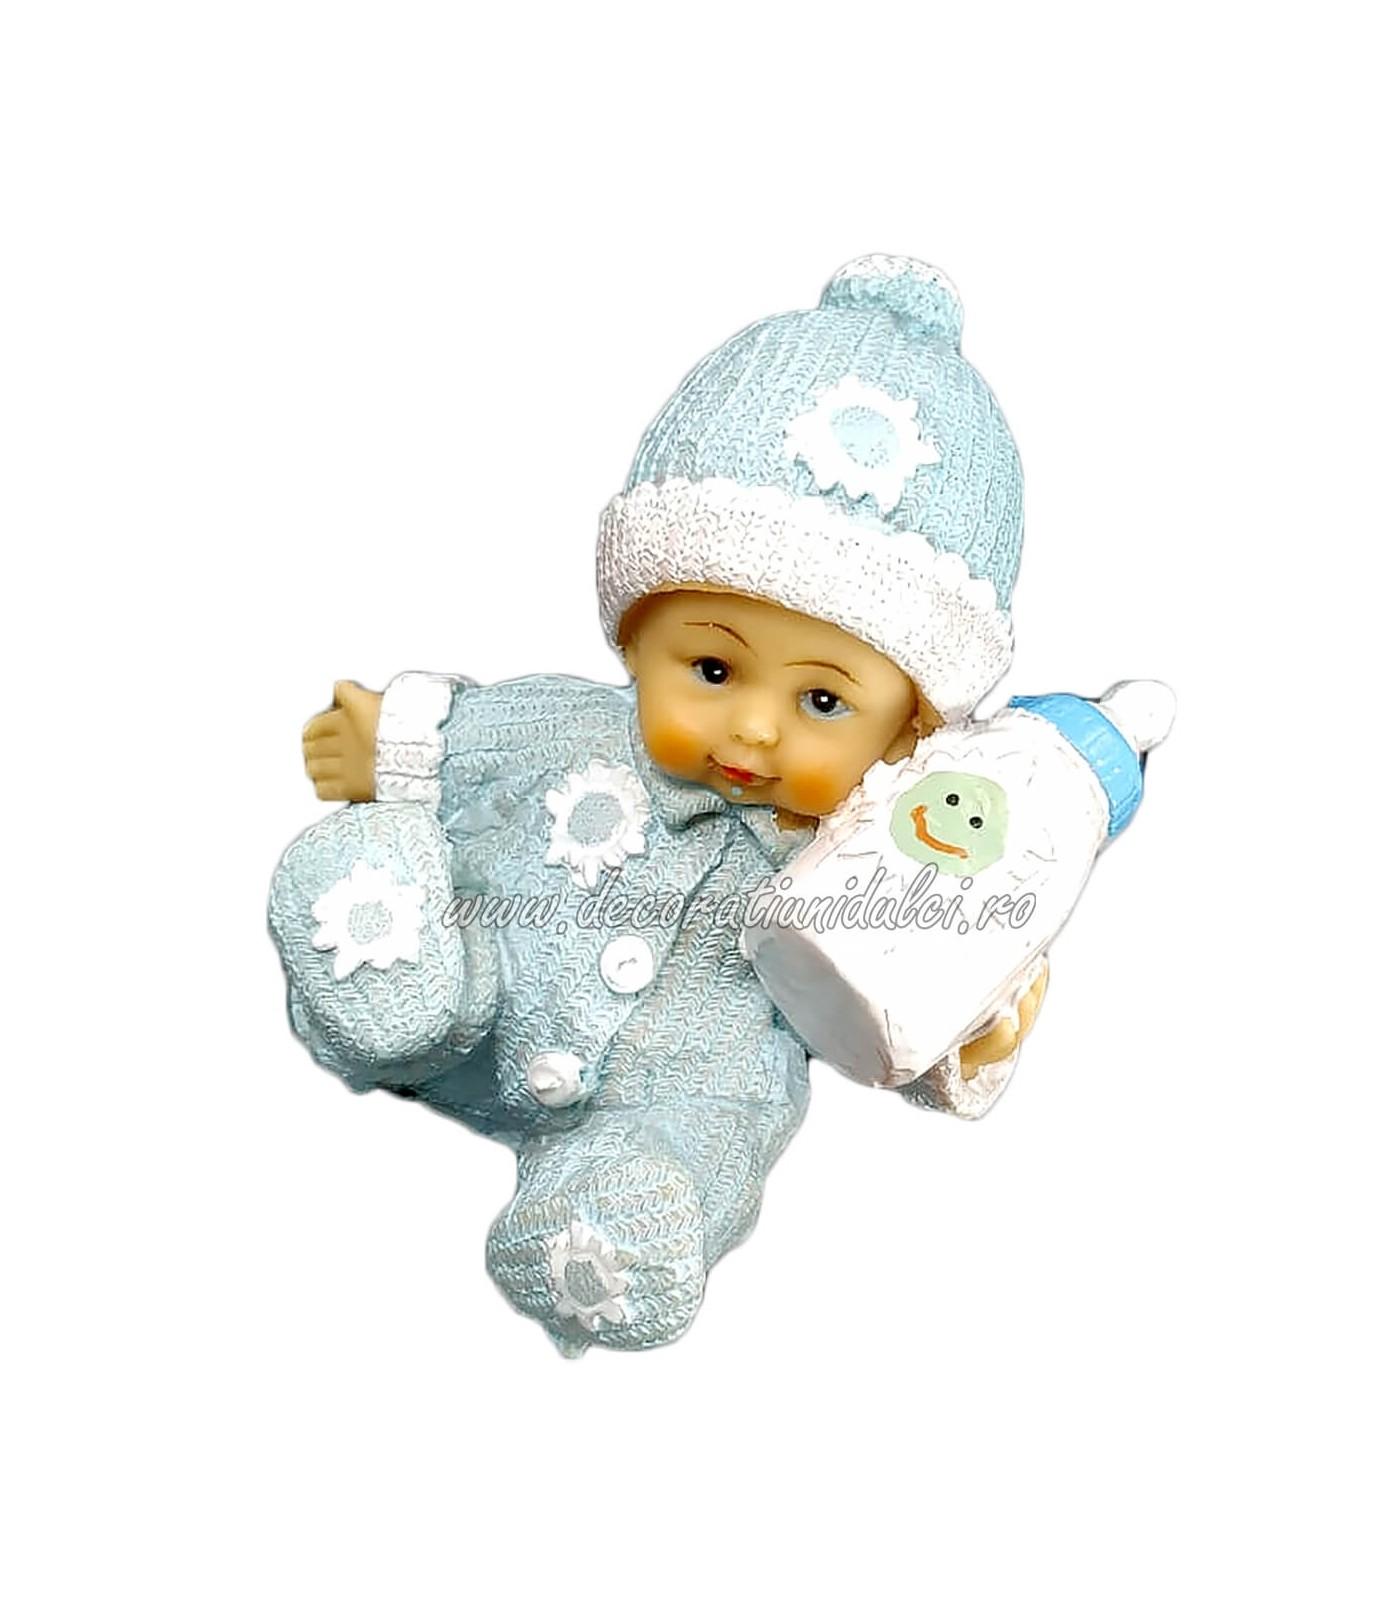 Figurina baietel cu biberon